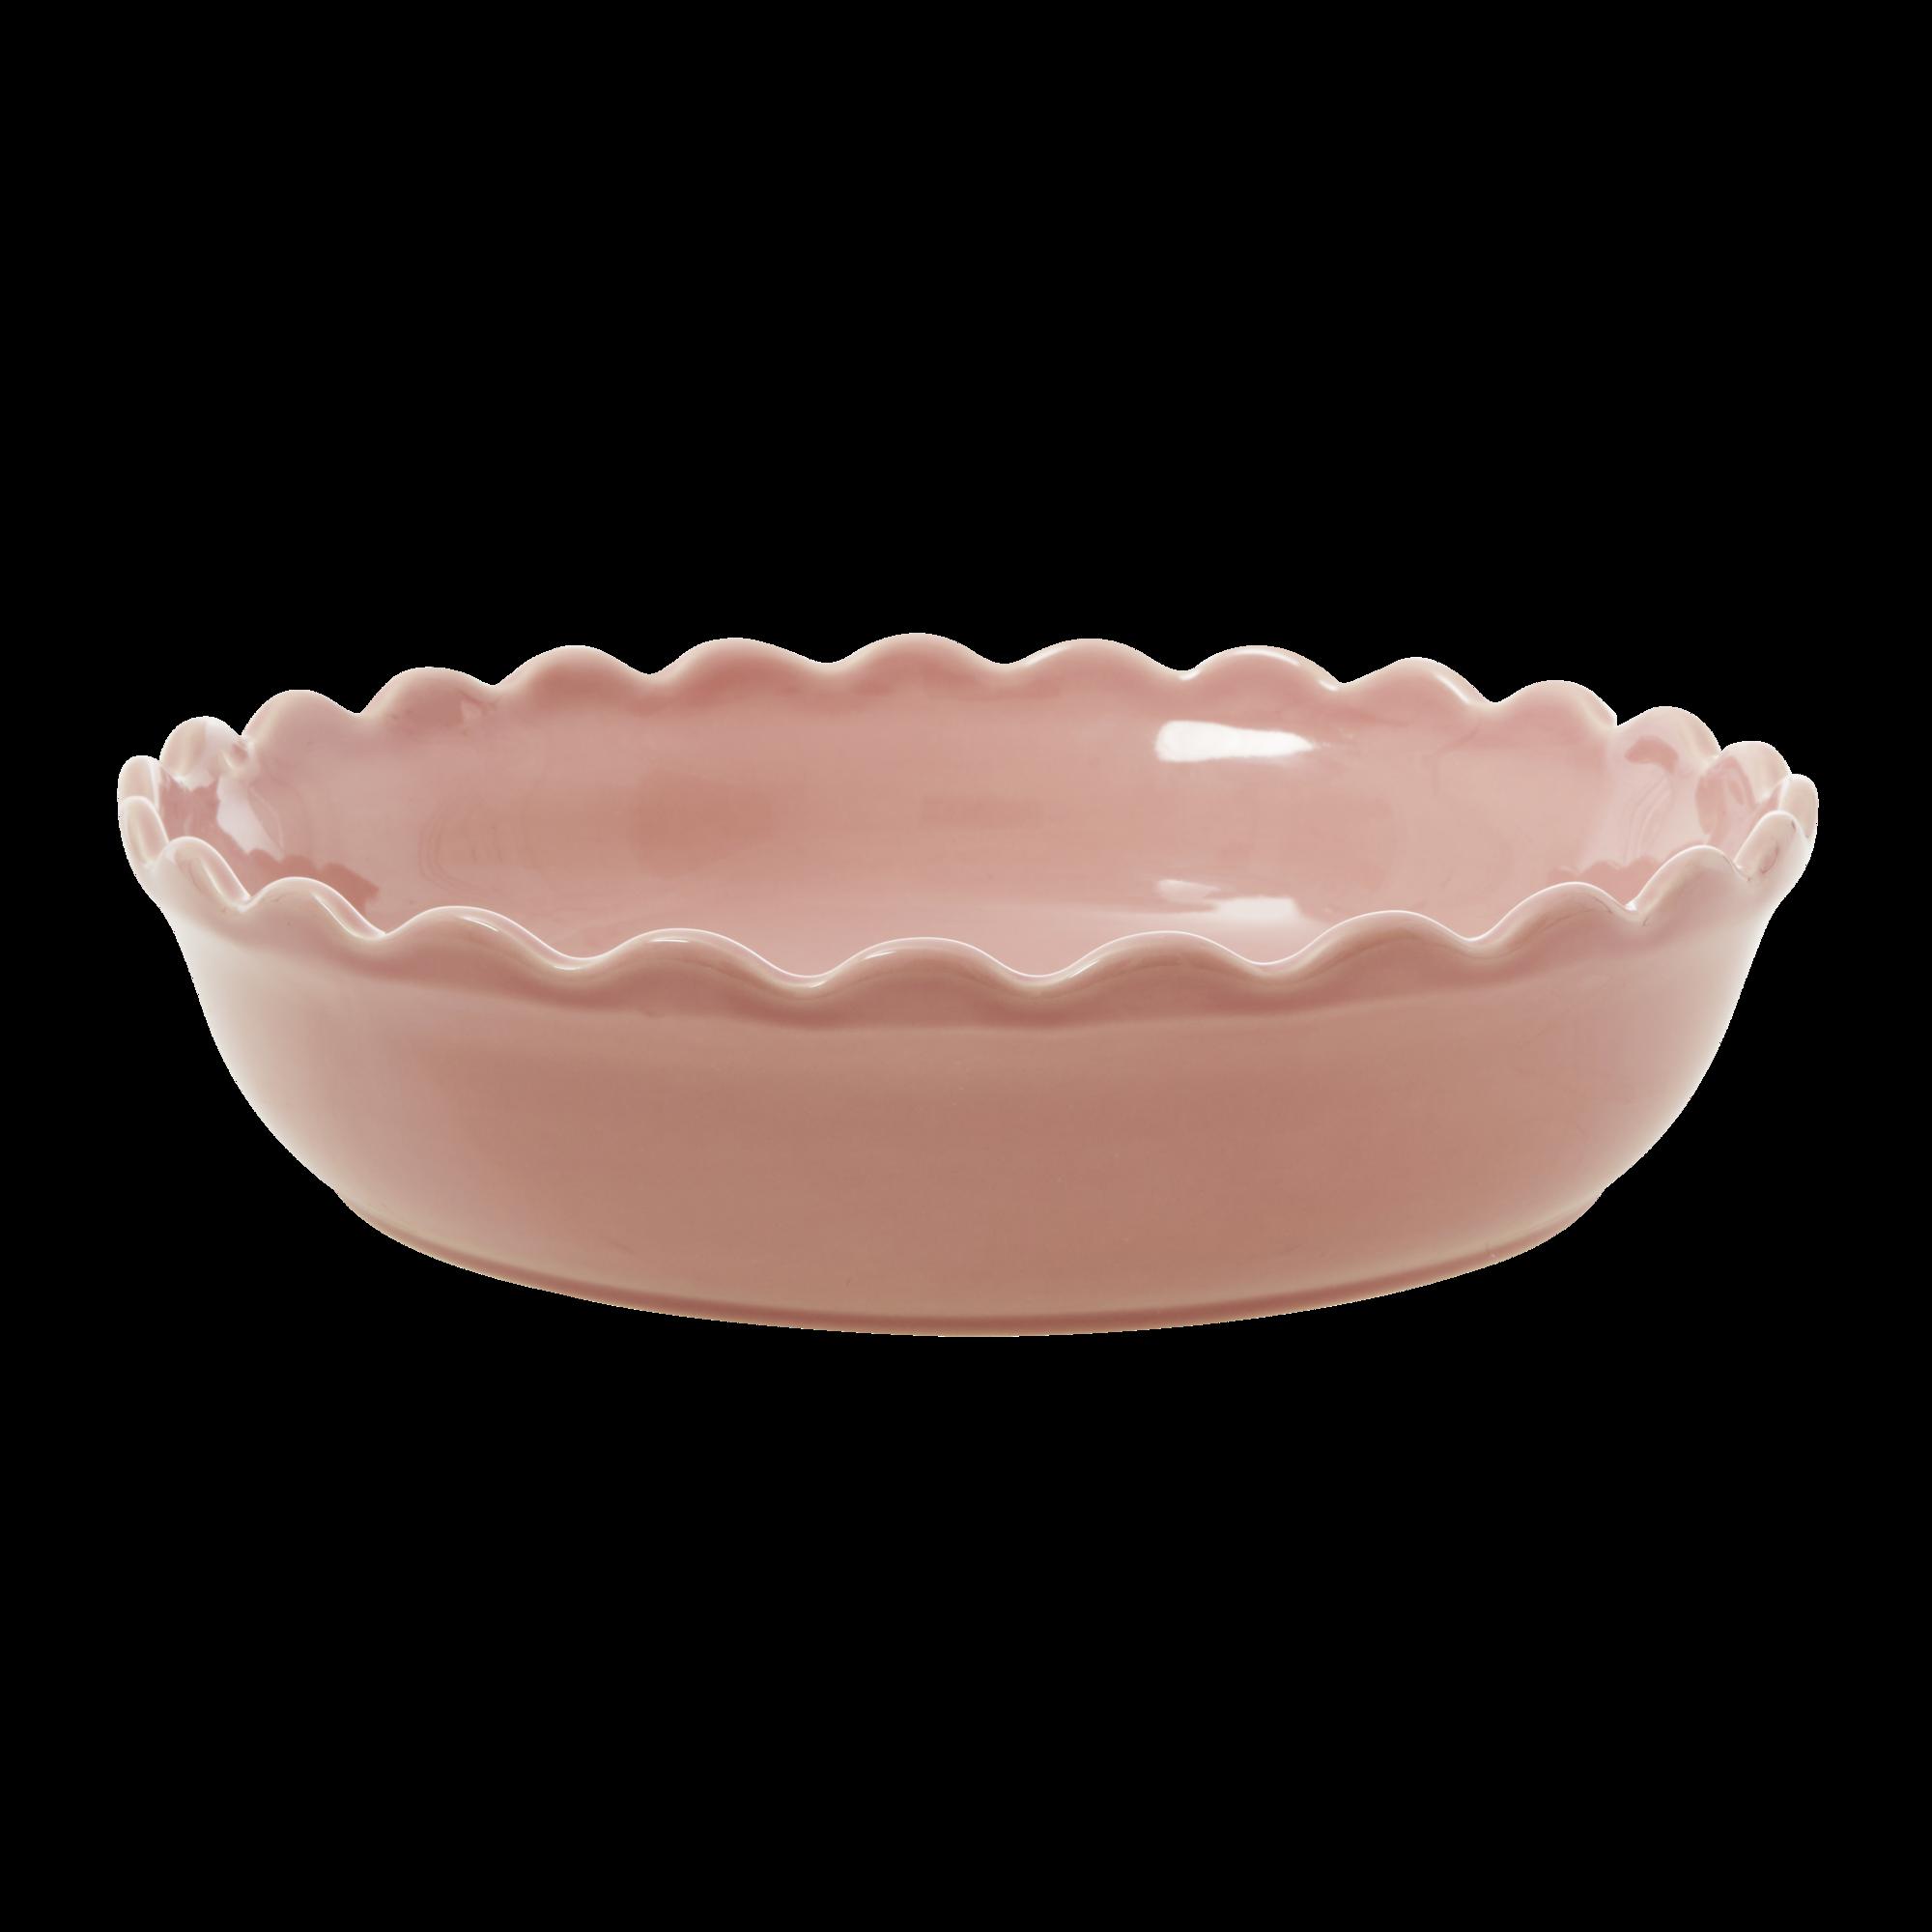 Rice - Stoneware Pie Dish - Pink L